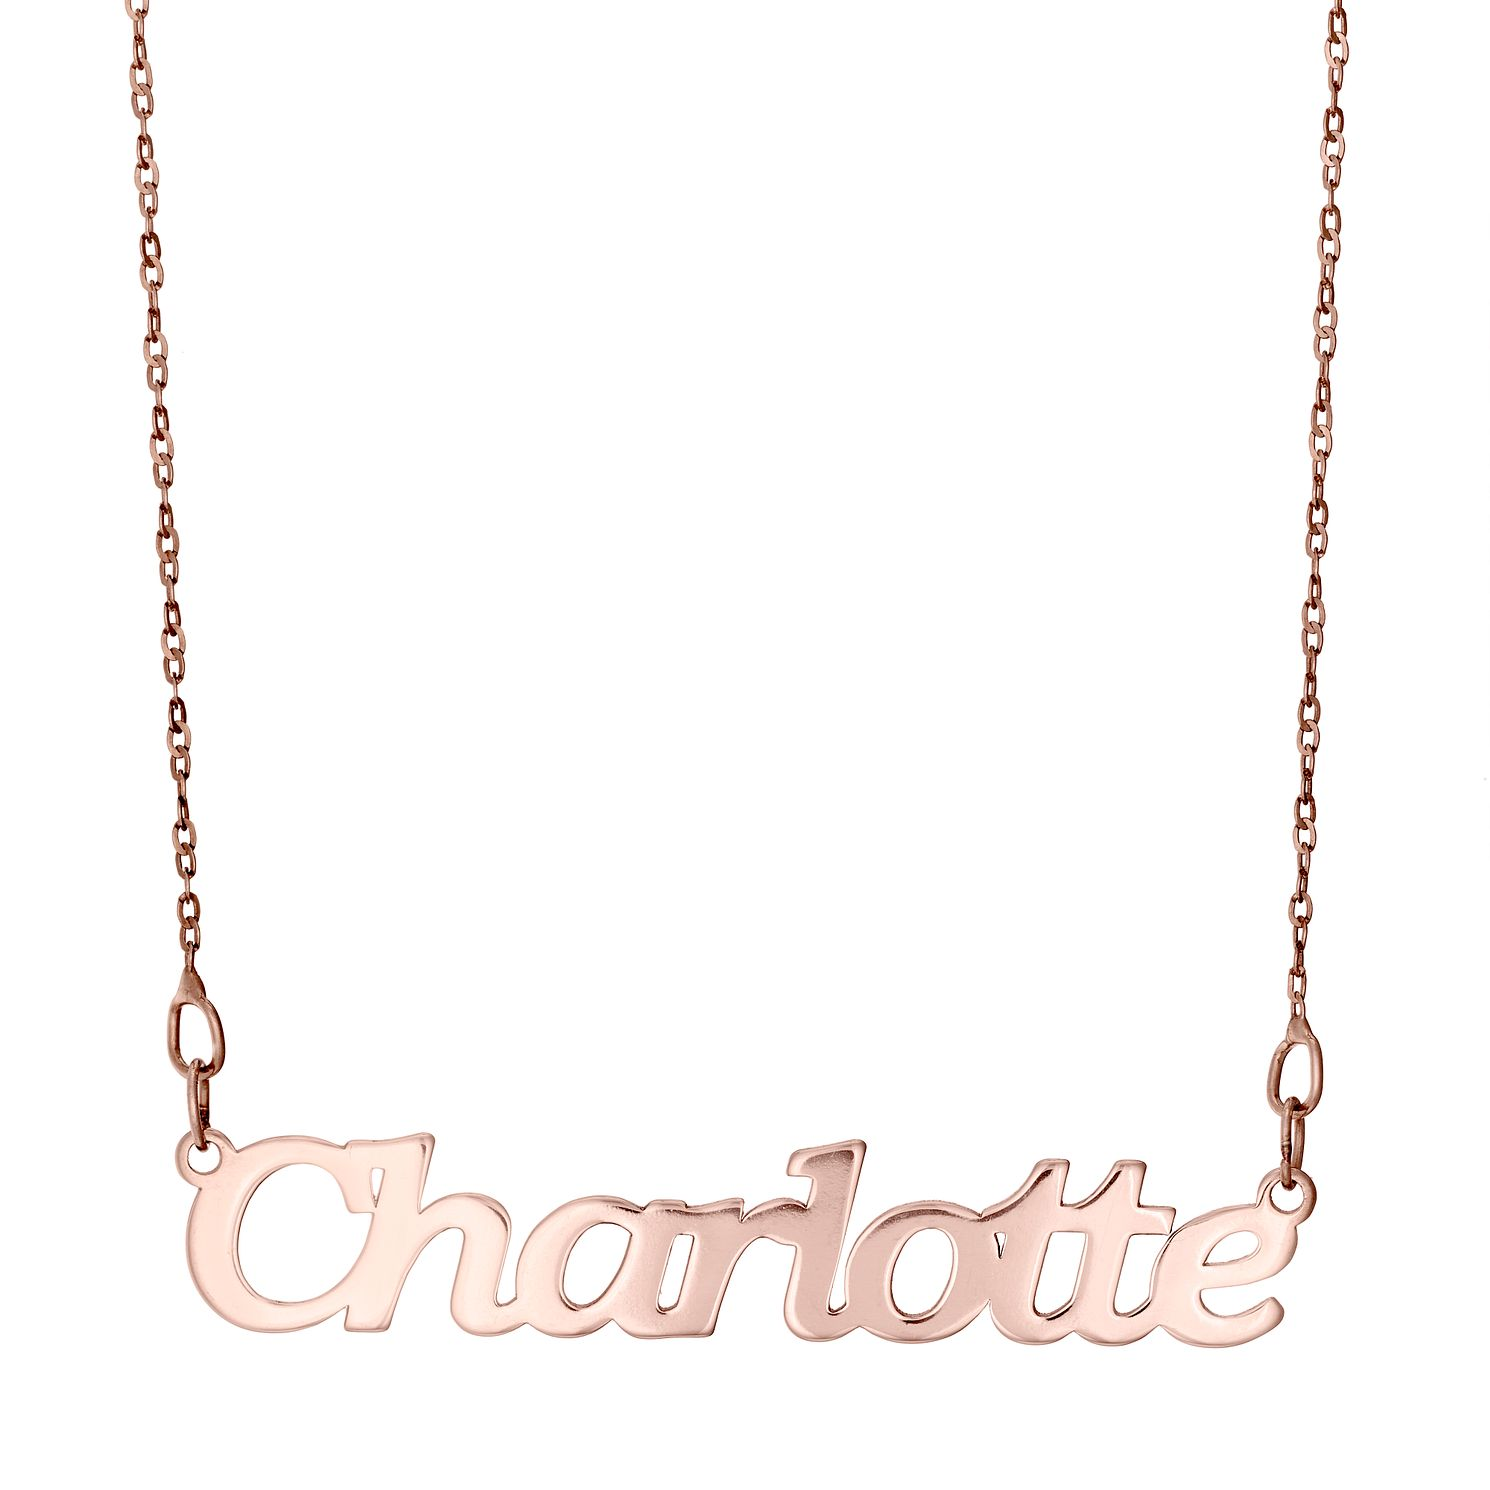 9ct Rose Gold 'Charlotte' Nameplate Necklace, | H Samuel